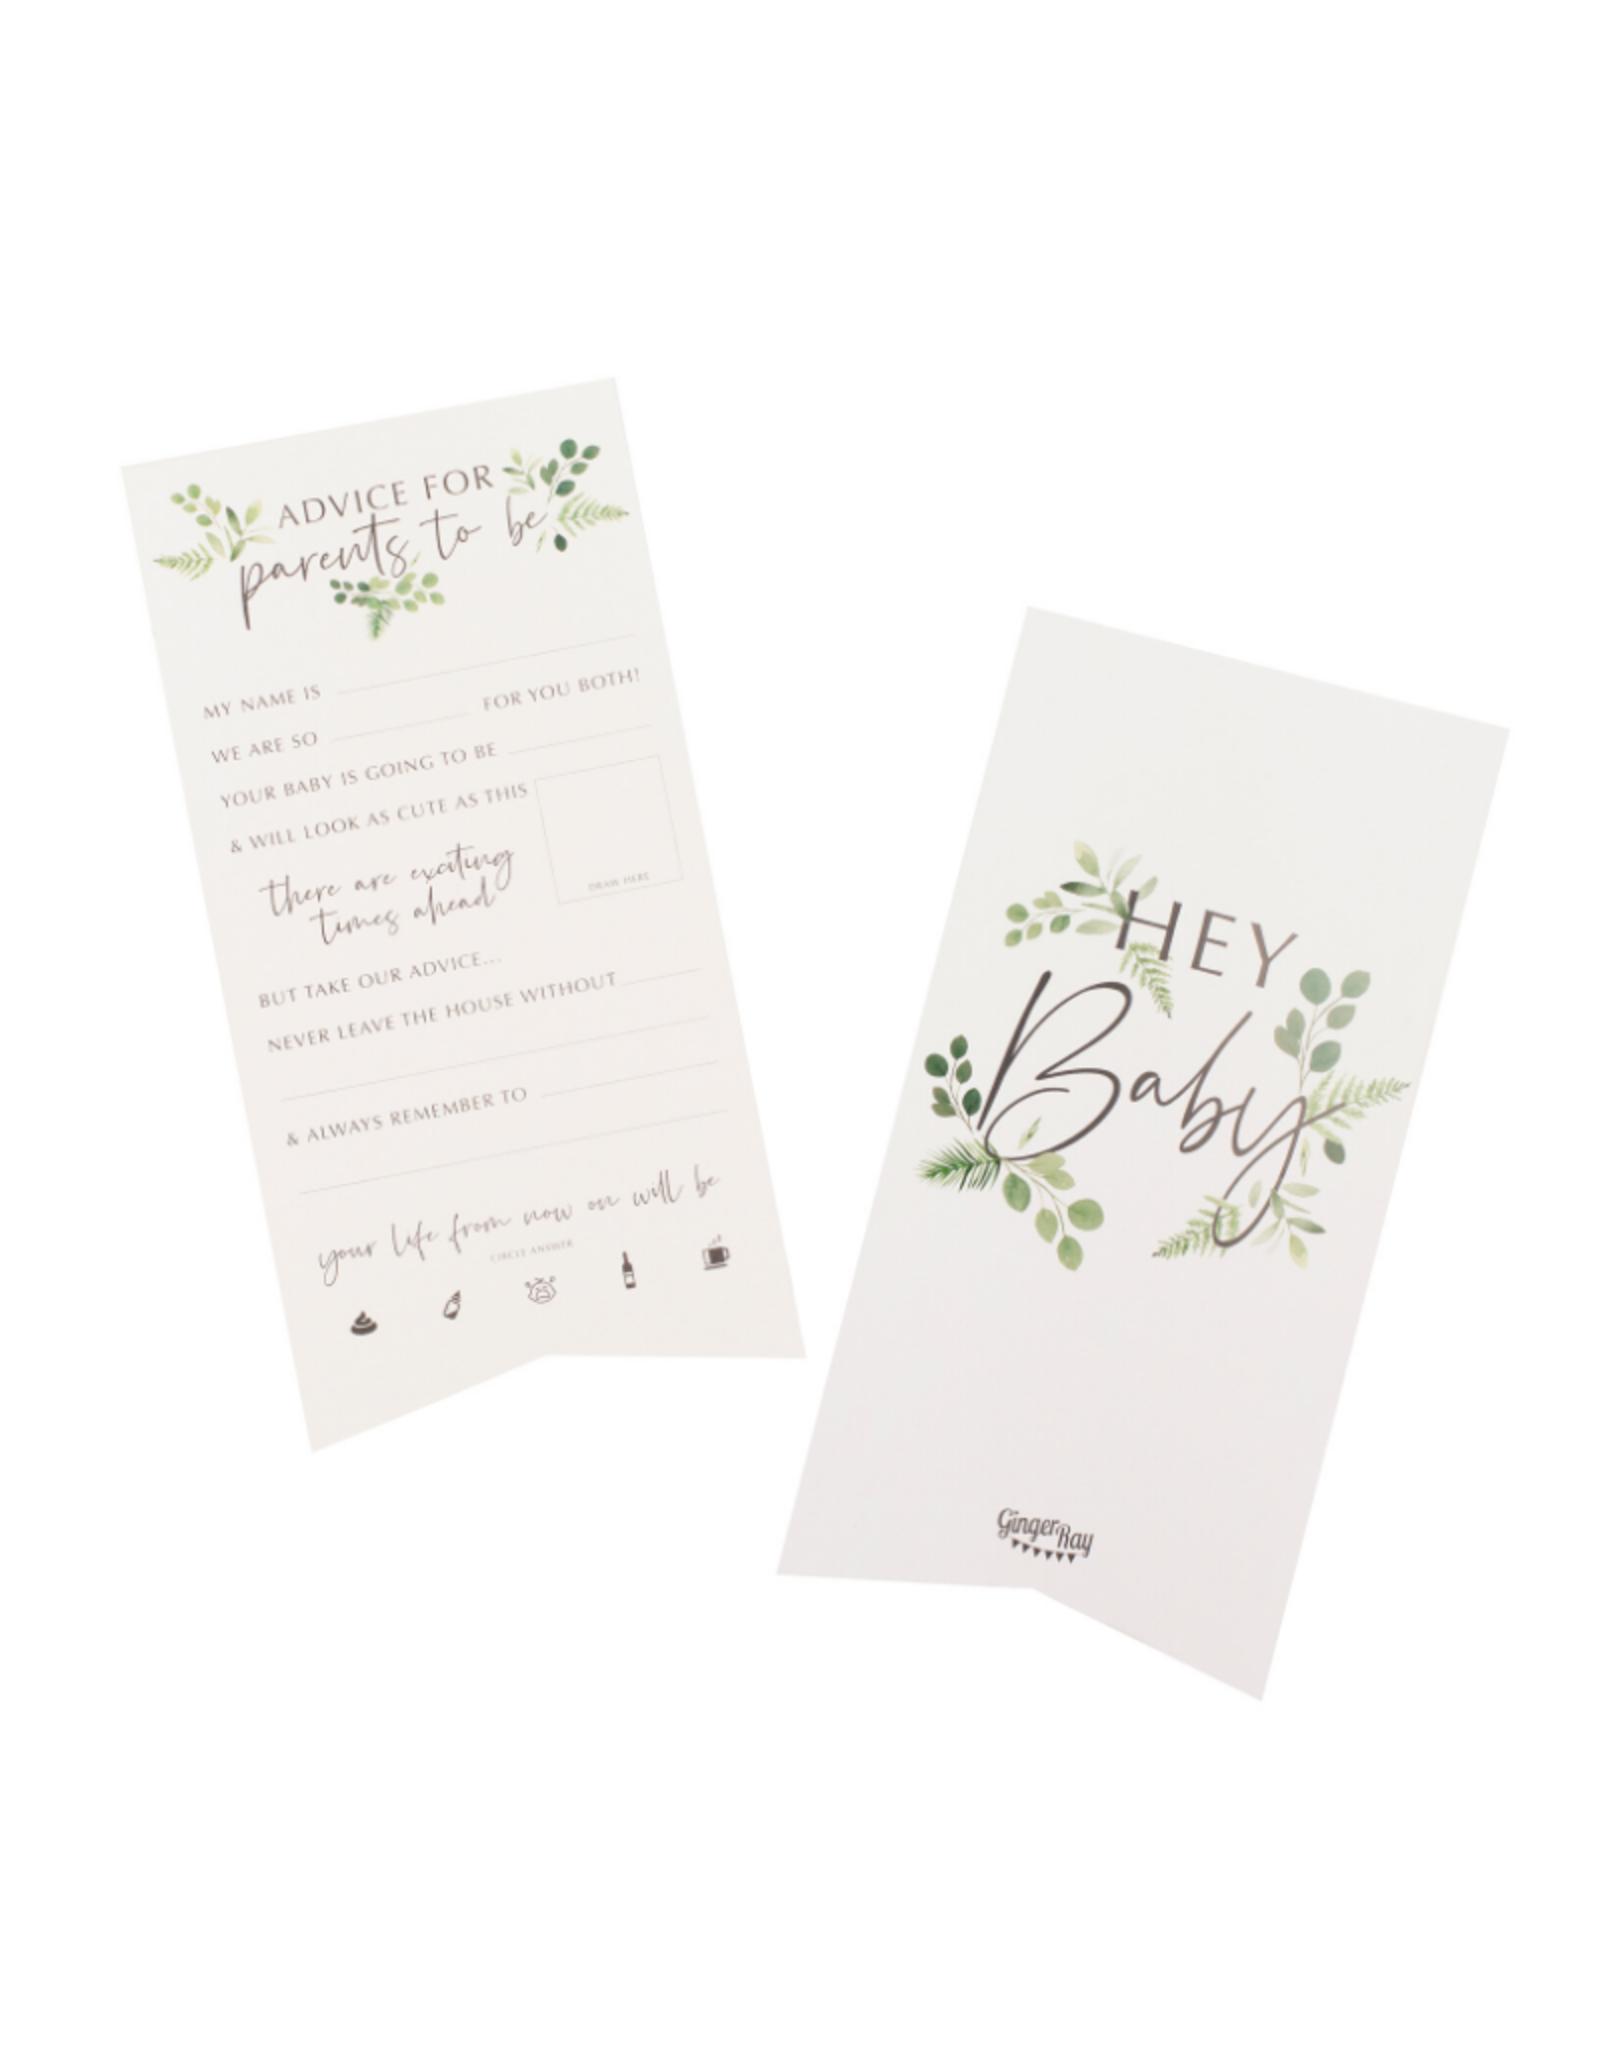 Ginger Ray Botanical Hey Baby Advieskaarten